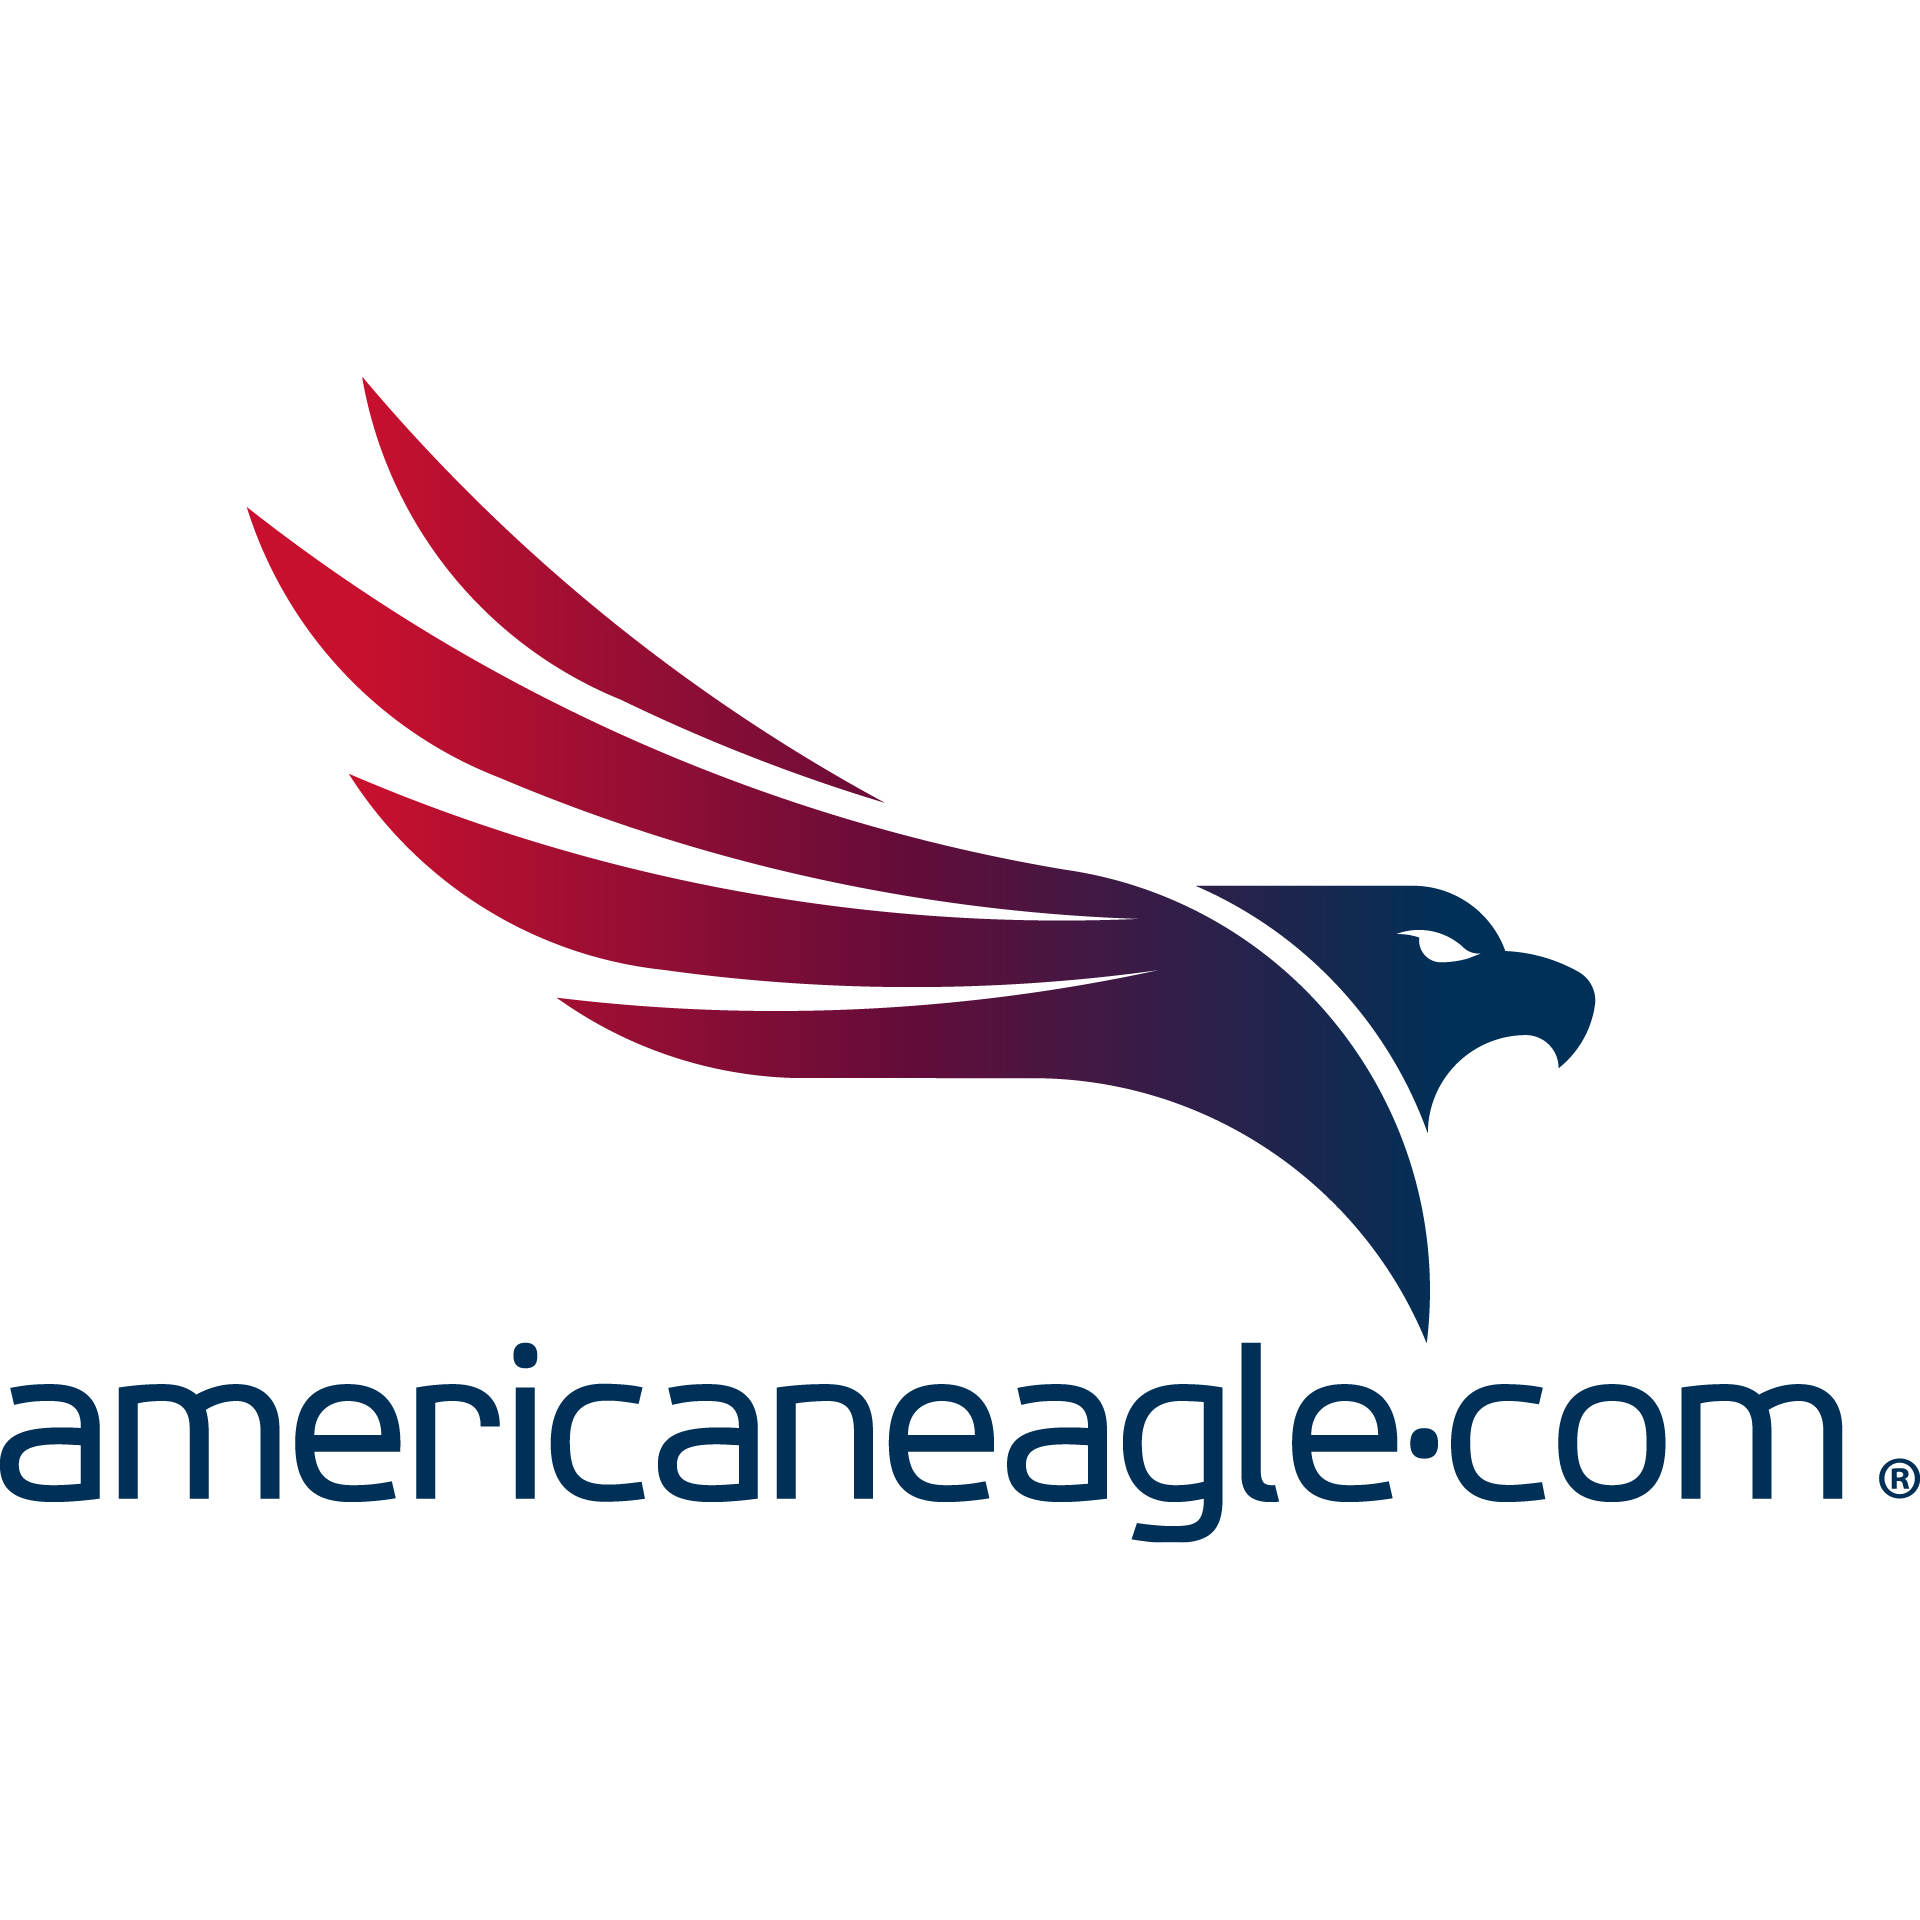 Americaneagle.com logo stacked rgb